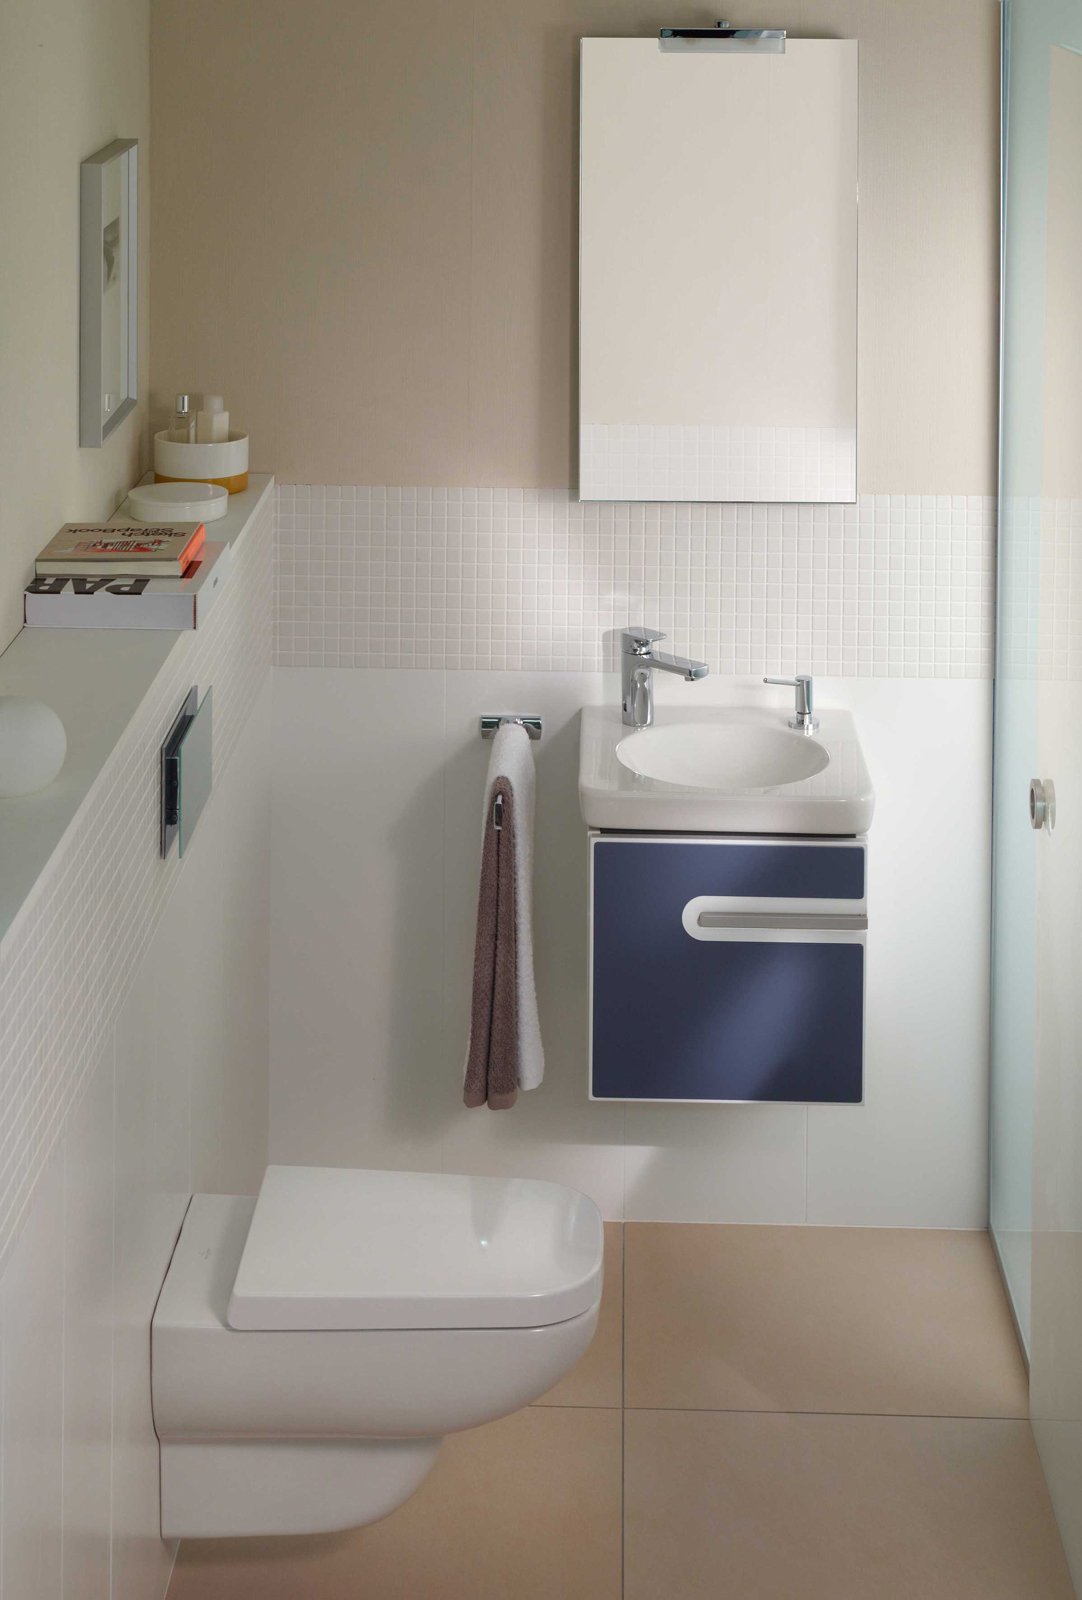 Bagni design piccoli spazi: mobile bagno sospeso moderno finitura ...